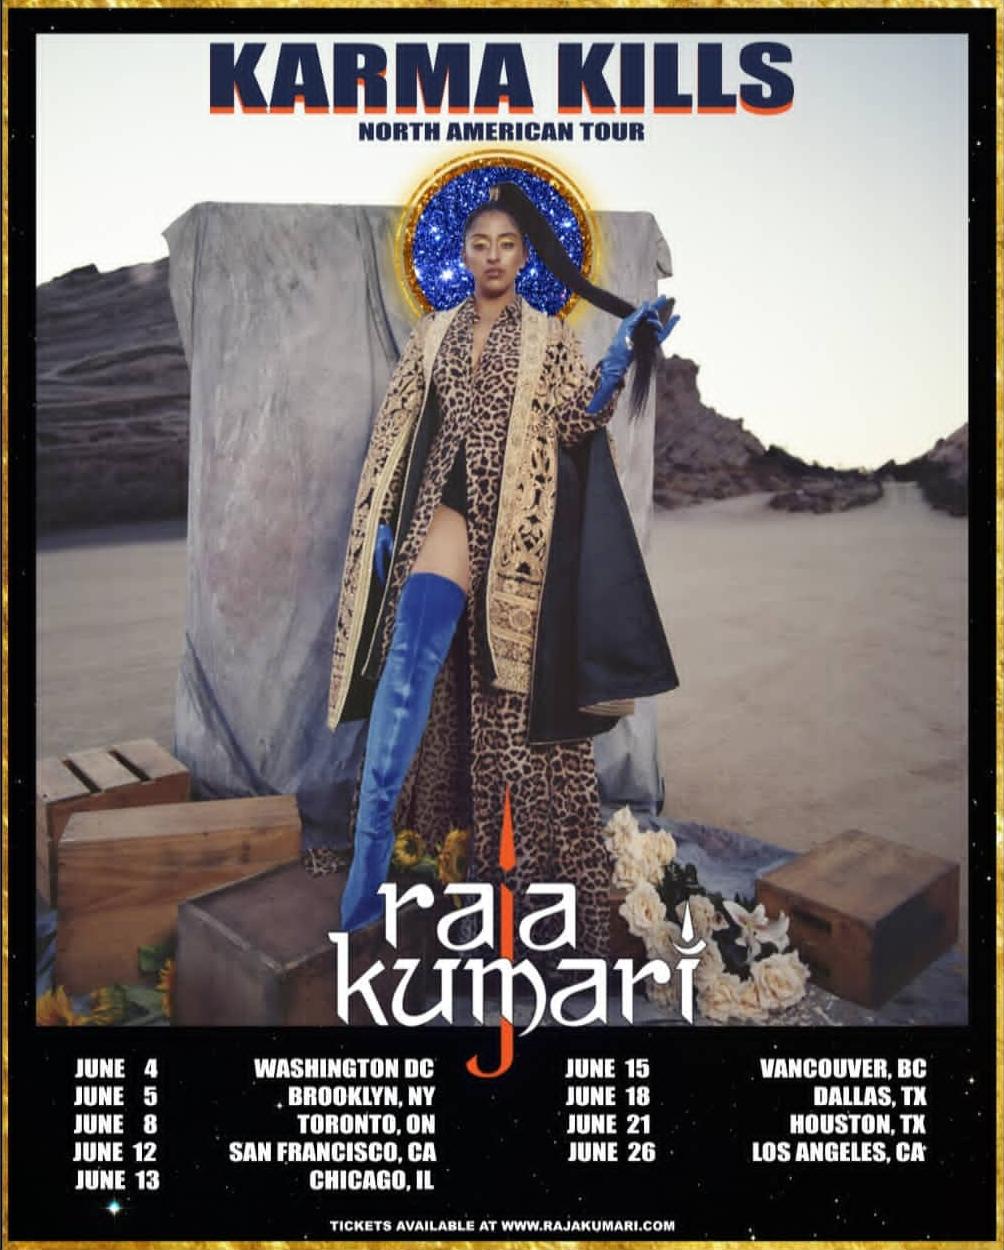 KARMA KILLS NORTH AMERICAN TOUR